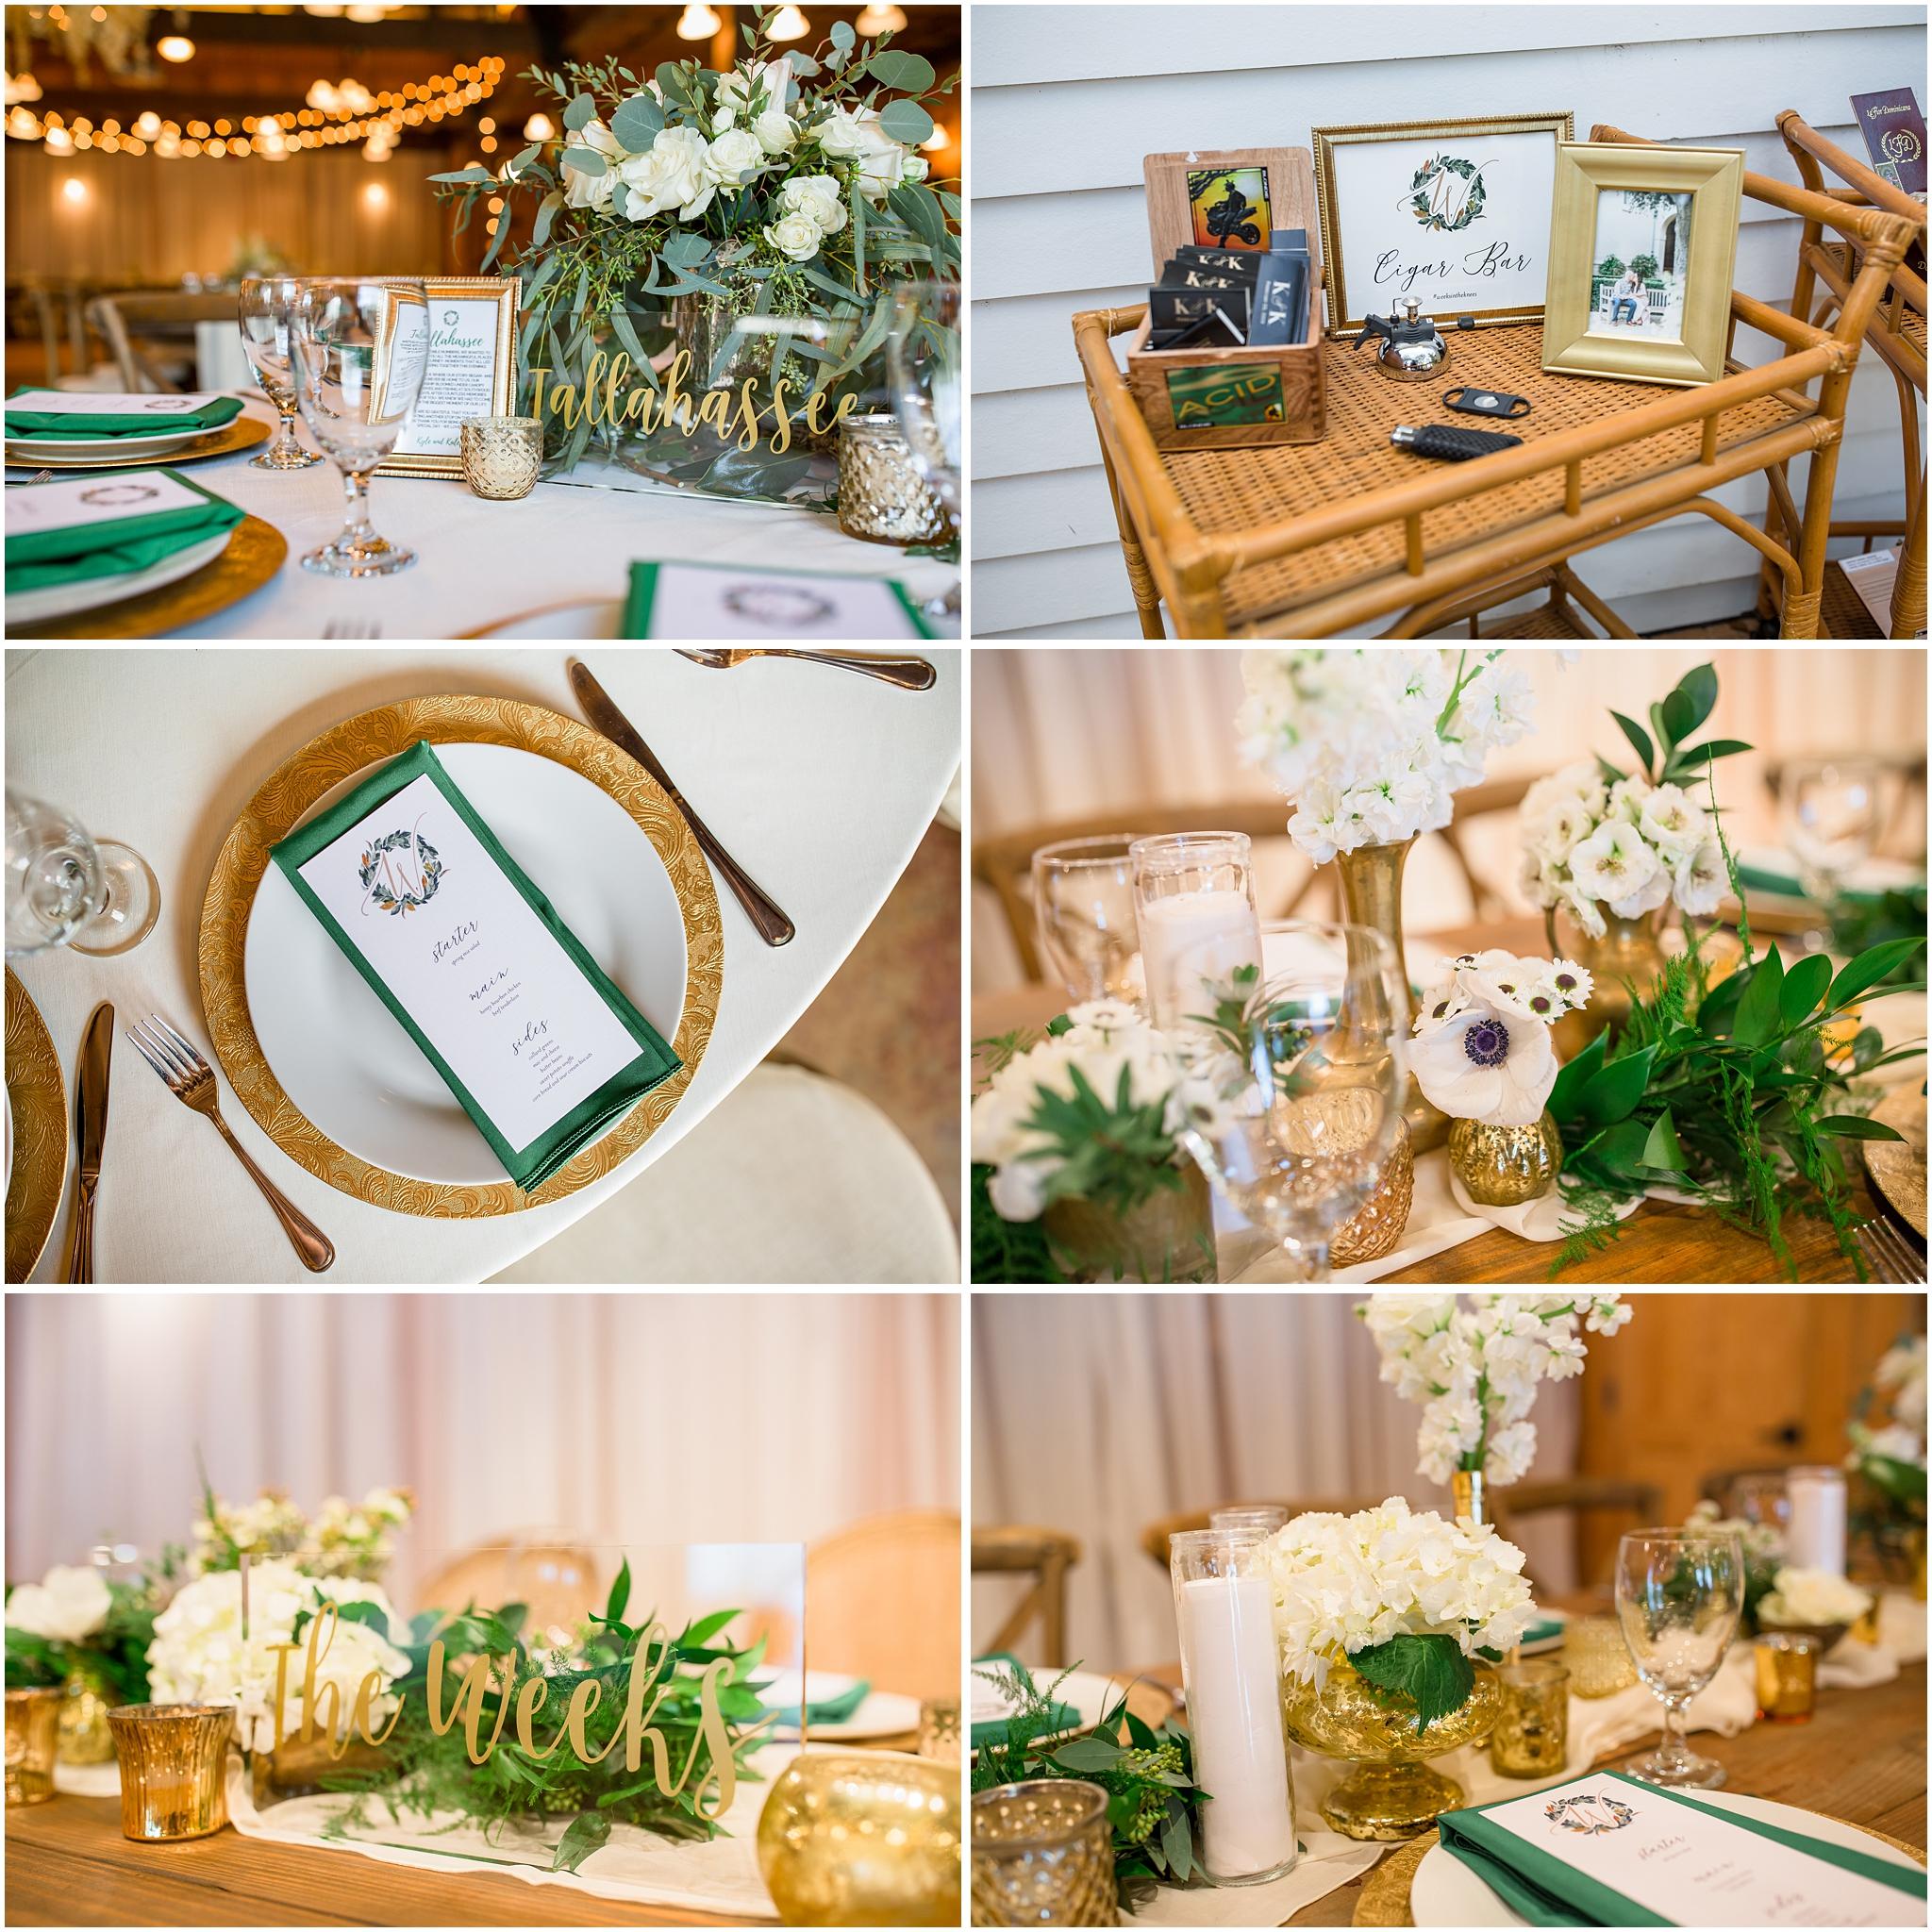 Papaya_Wedding_Planning_Charlotte_Fristoe.jpg